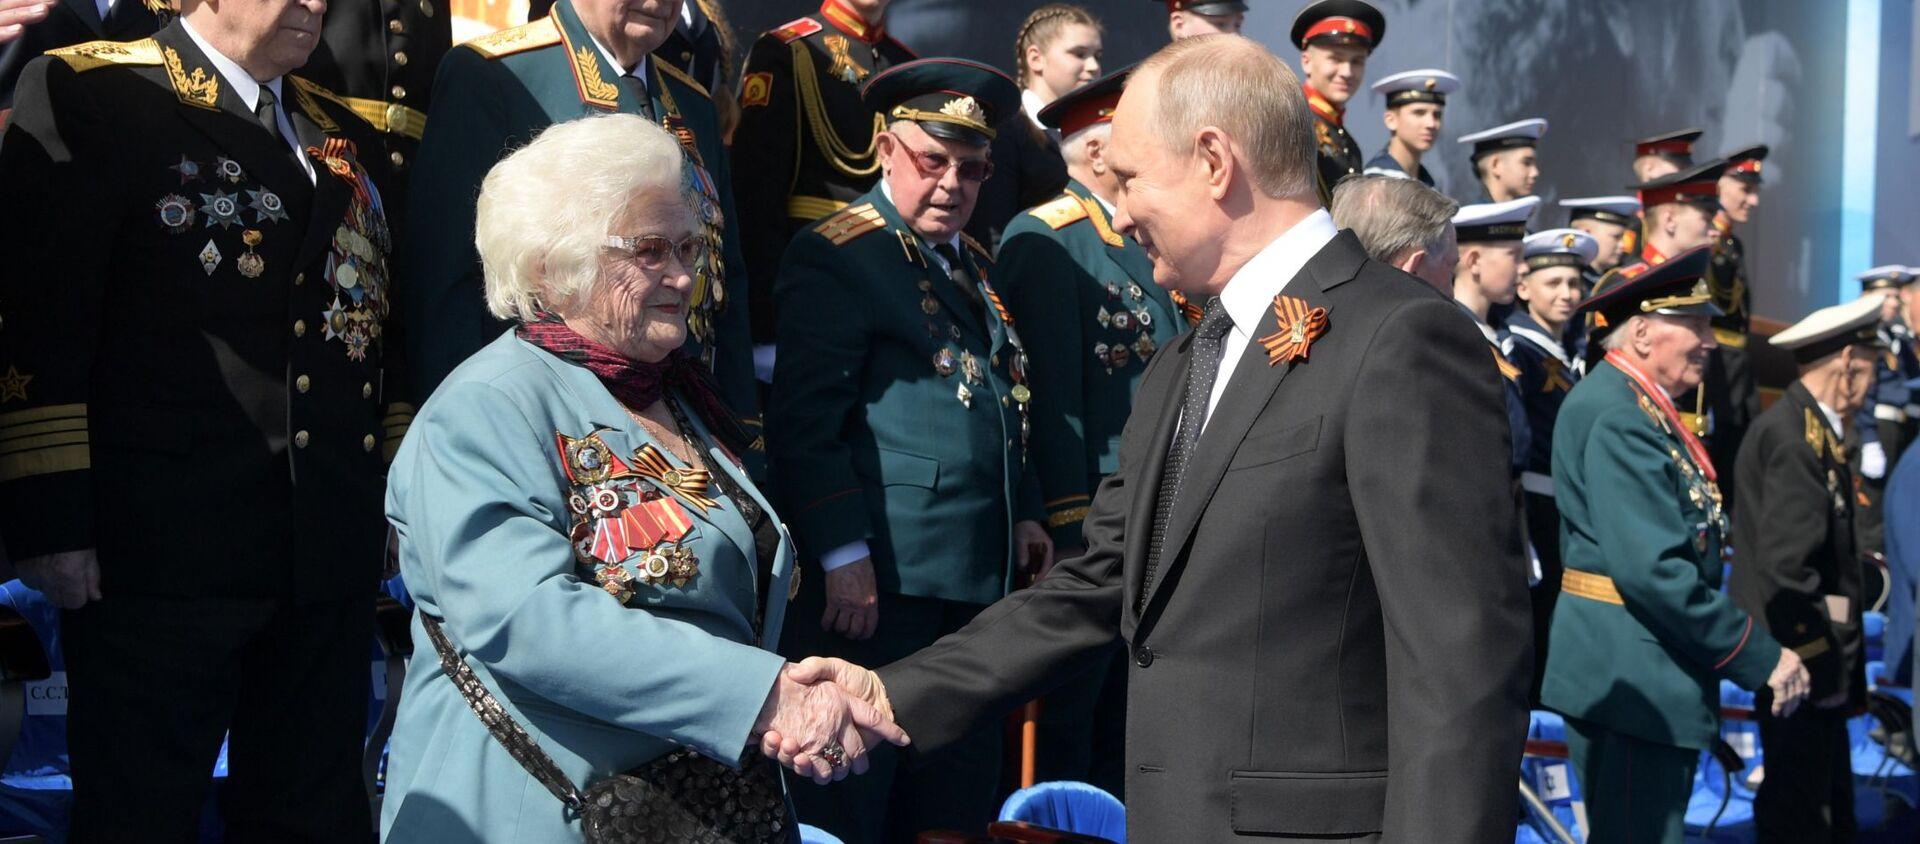 Galina Brok-Beltsova, exnavegante aérea y veterana de la Gran Guerra Patria - Sputnik Mundo, 1920, 22.06.2019